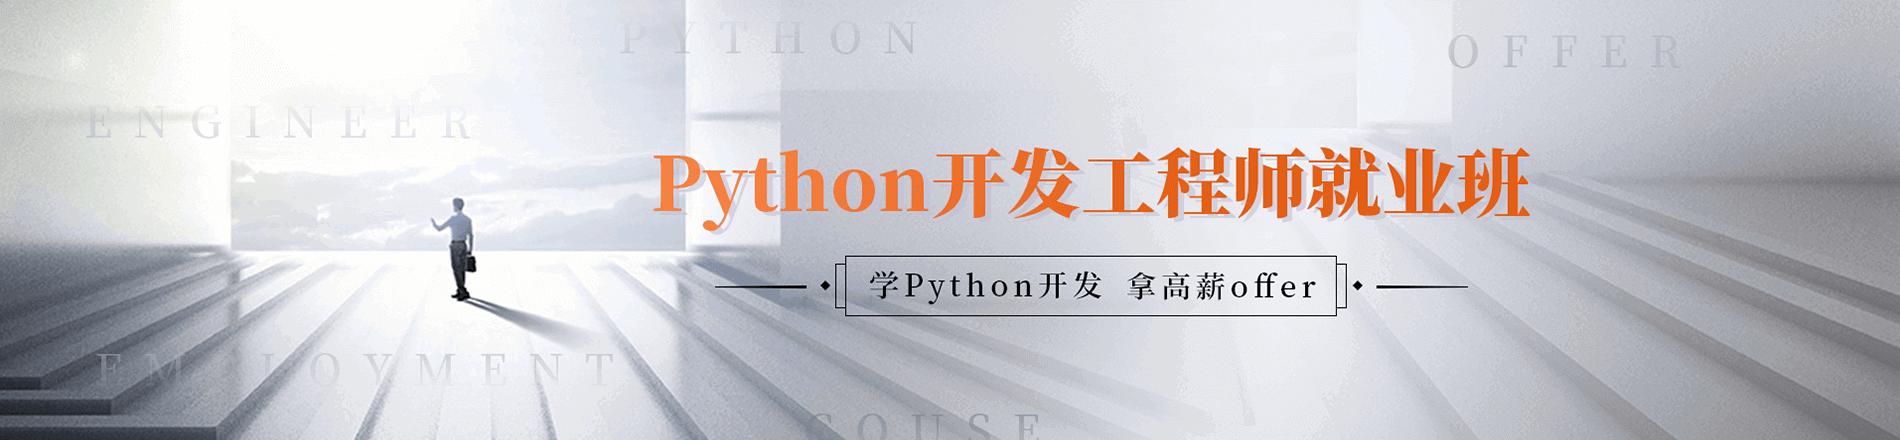 Python开发工程师就业班